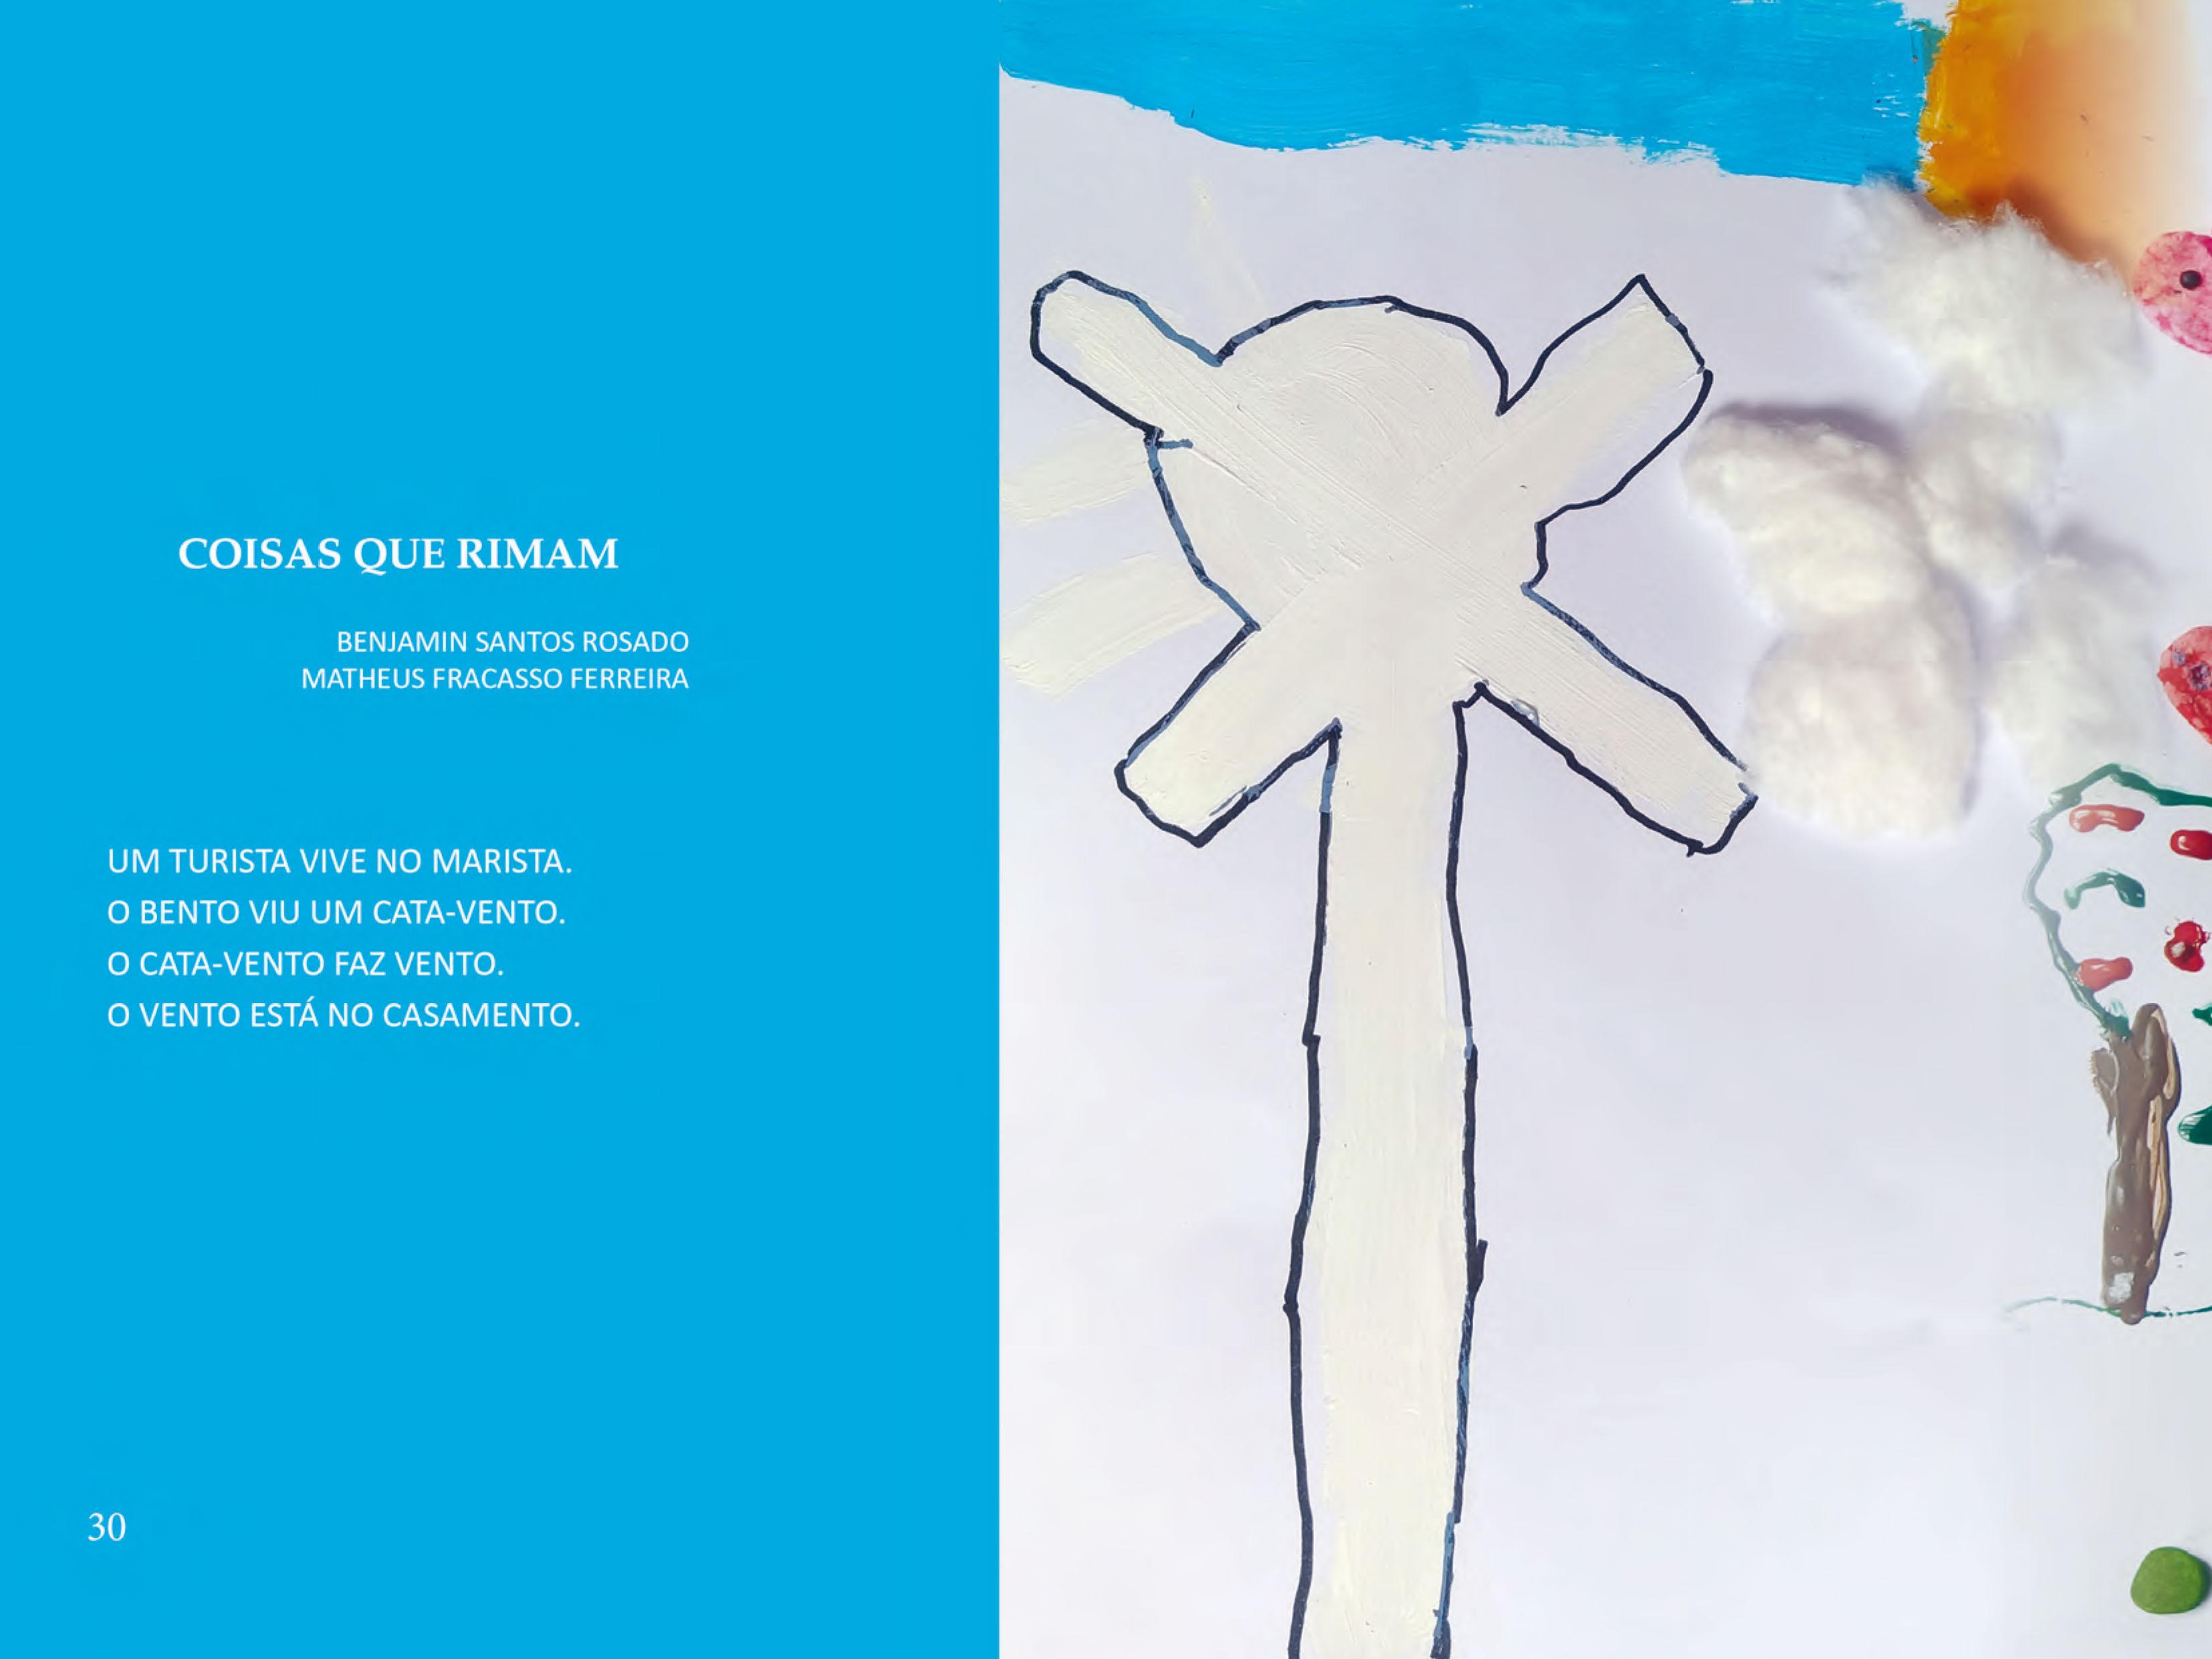 S2C - MIOLO - LIVRO COLÉGIO MARISTA GRAÇ